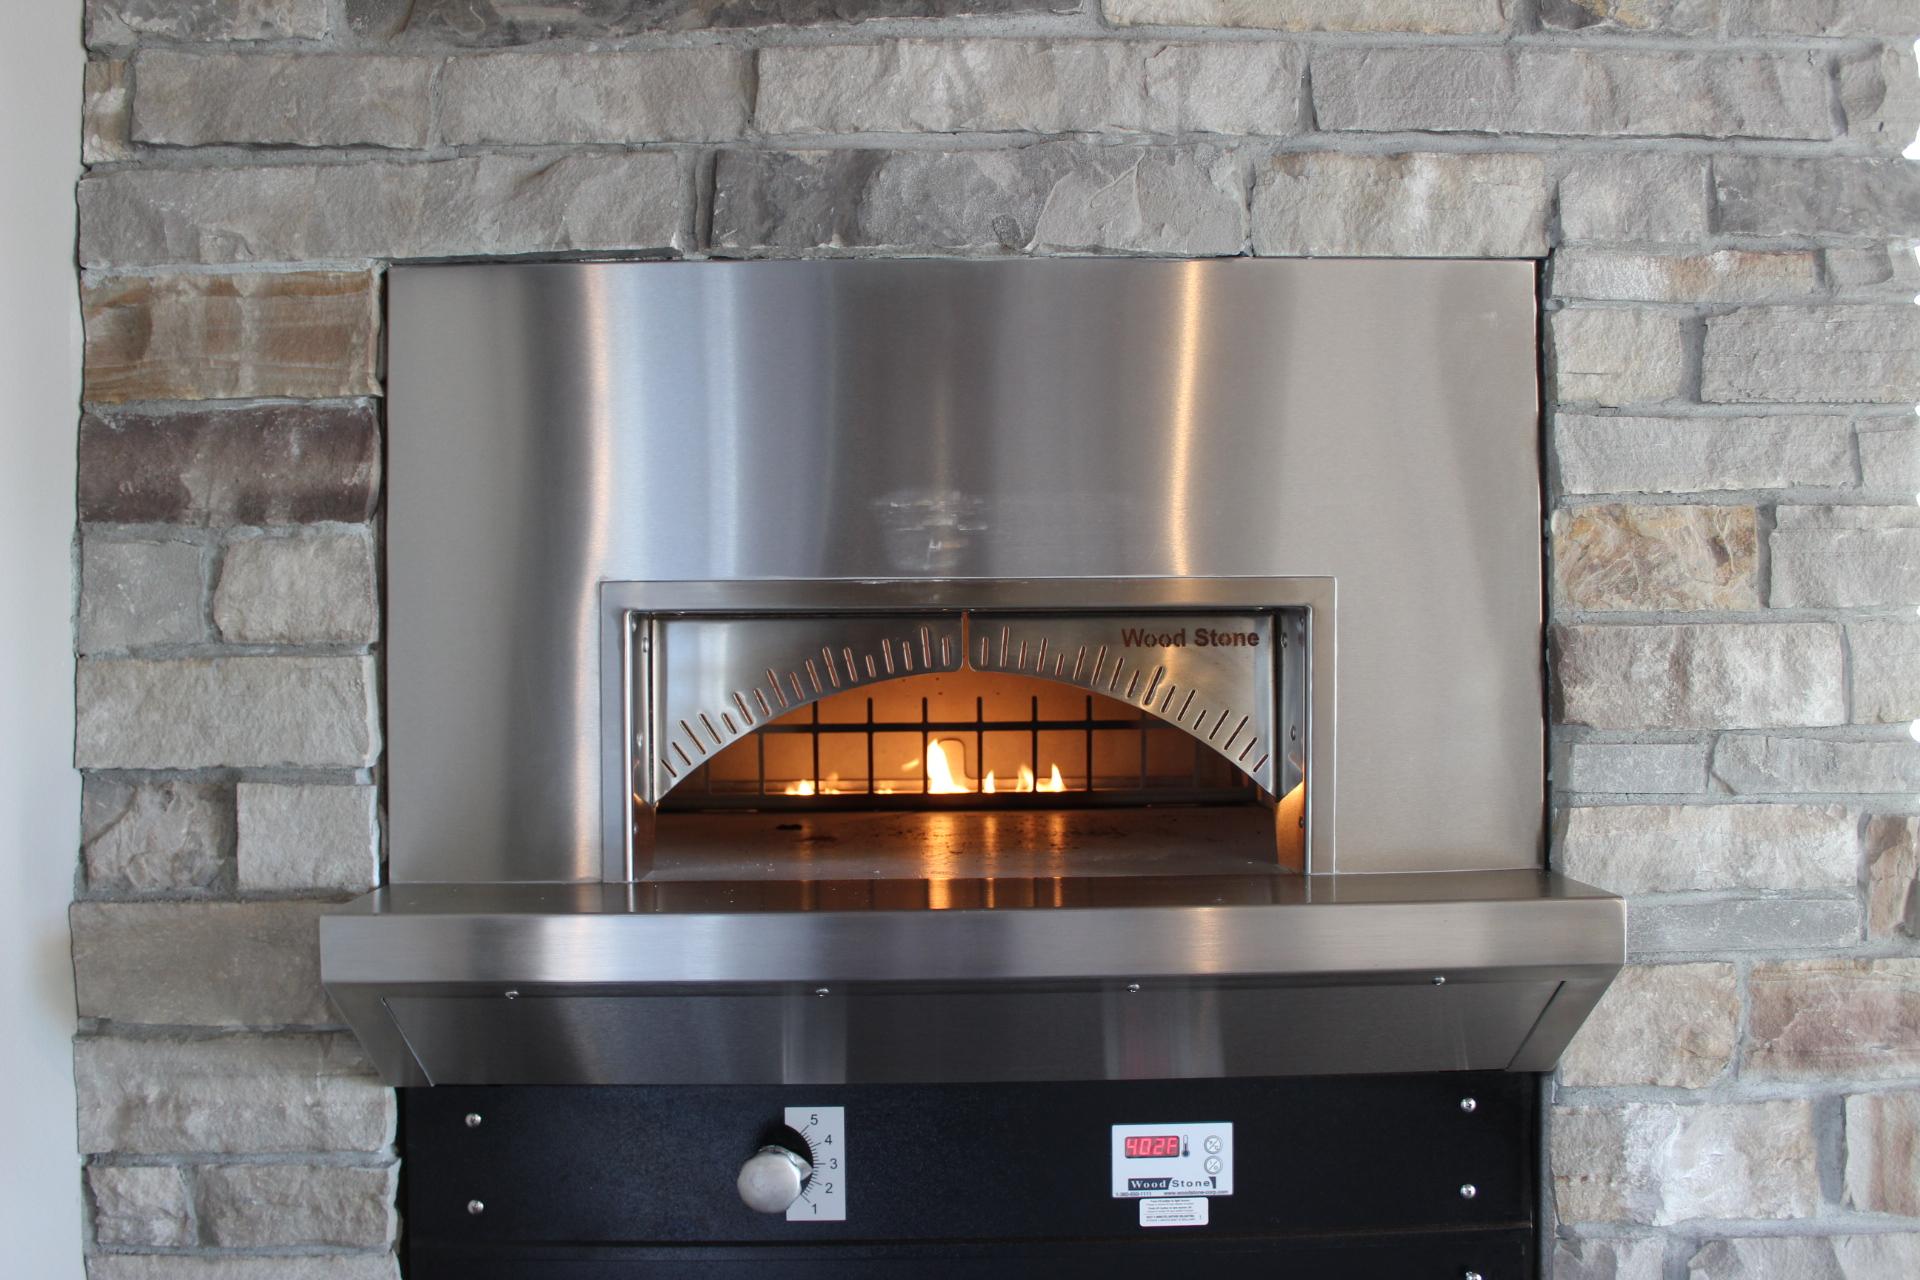 10-Brick Oven Pizza Anyone.jpg